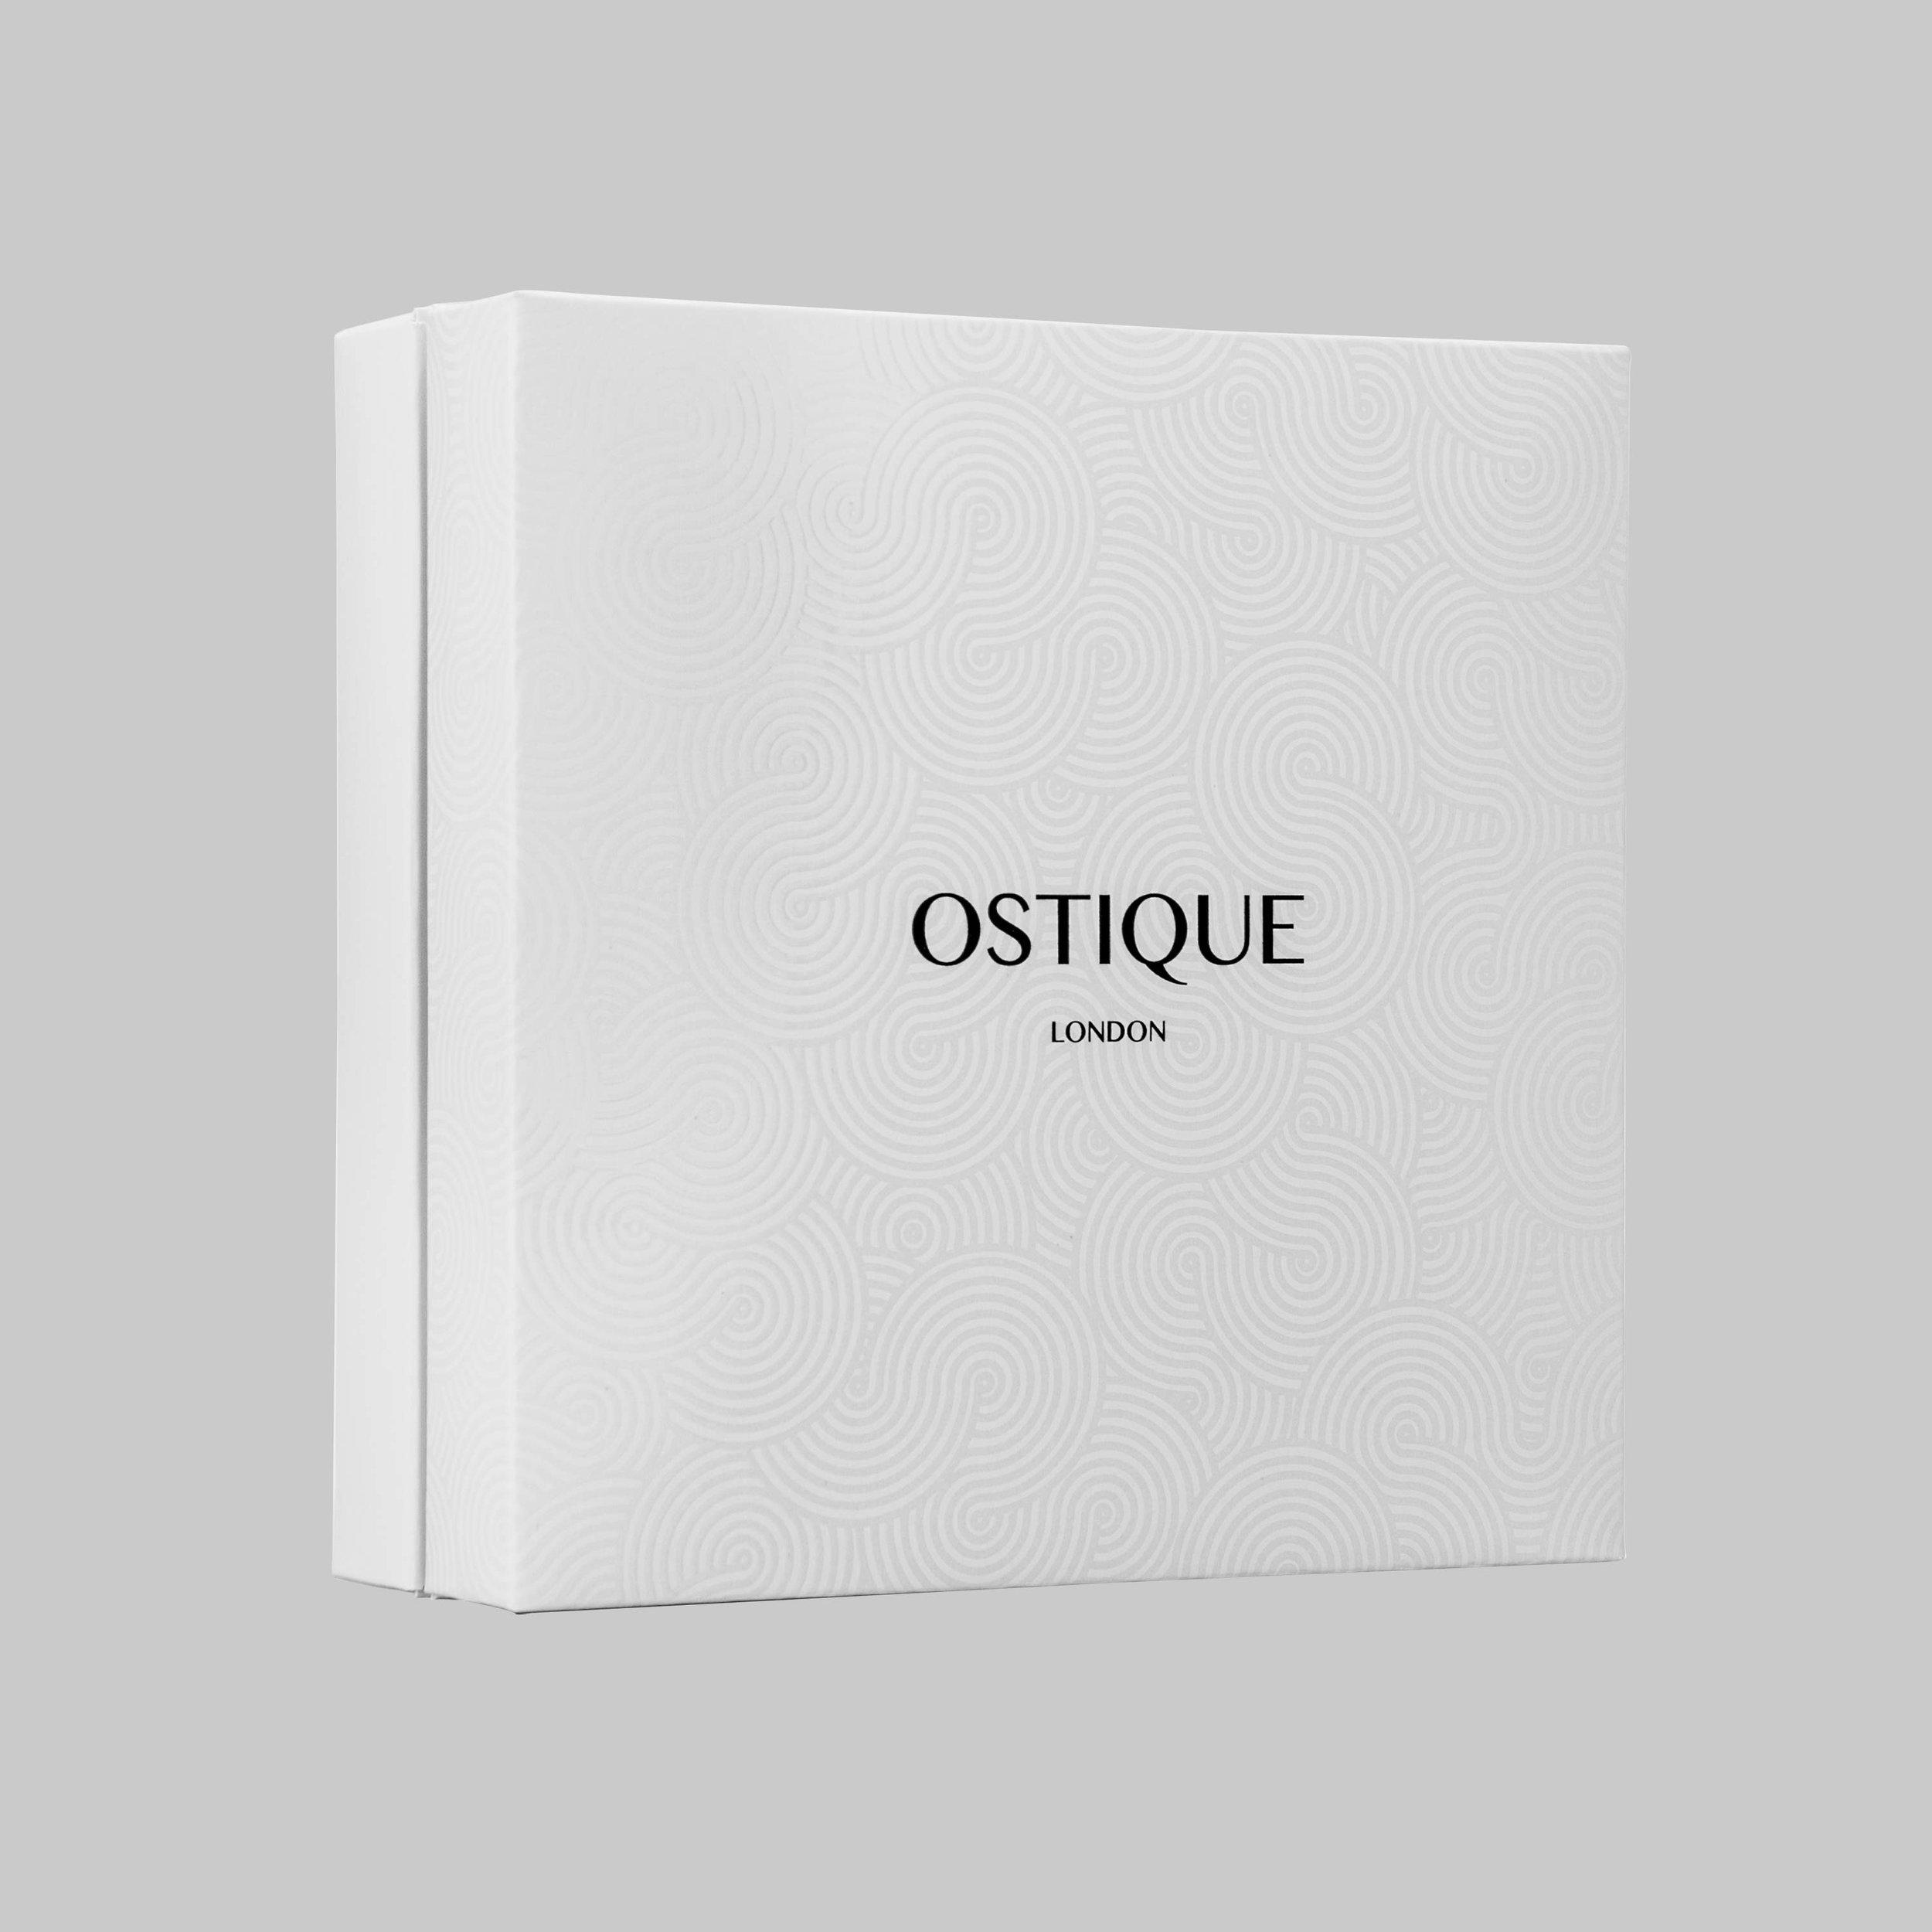 Ostique-Ostomy-Packaging-Design-Box-Packaging-Prototype-Design.jpg